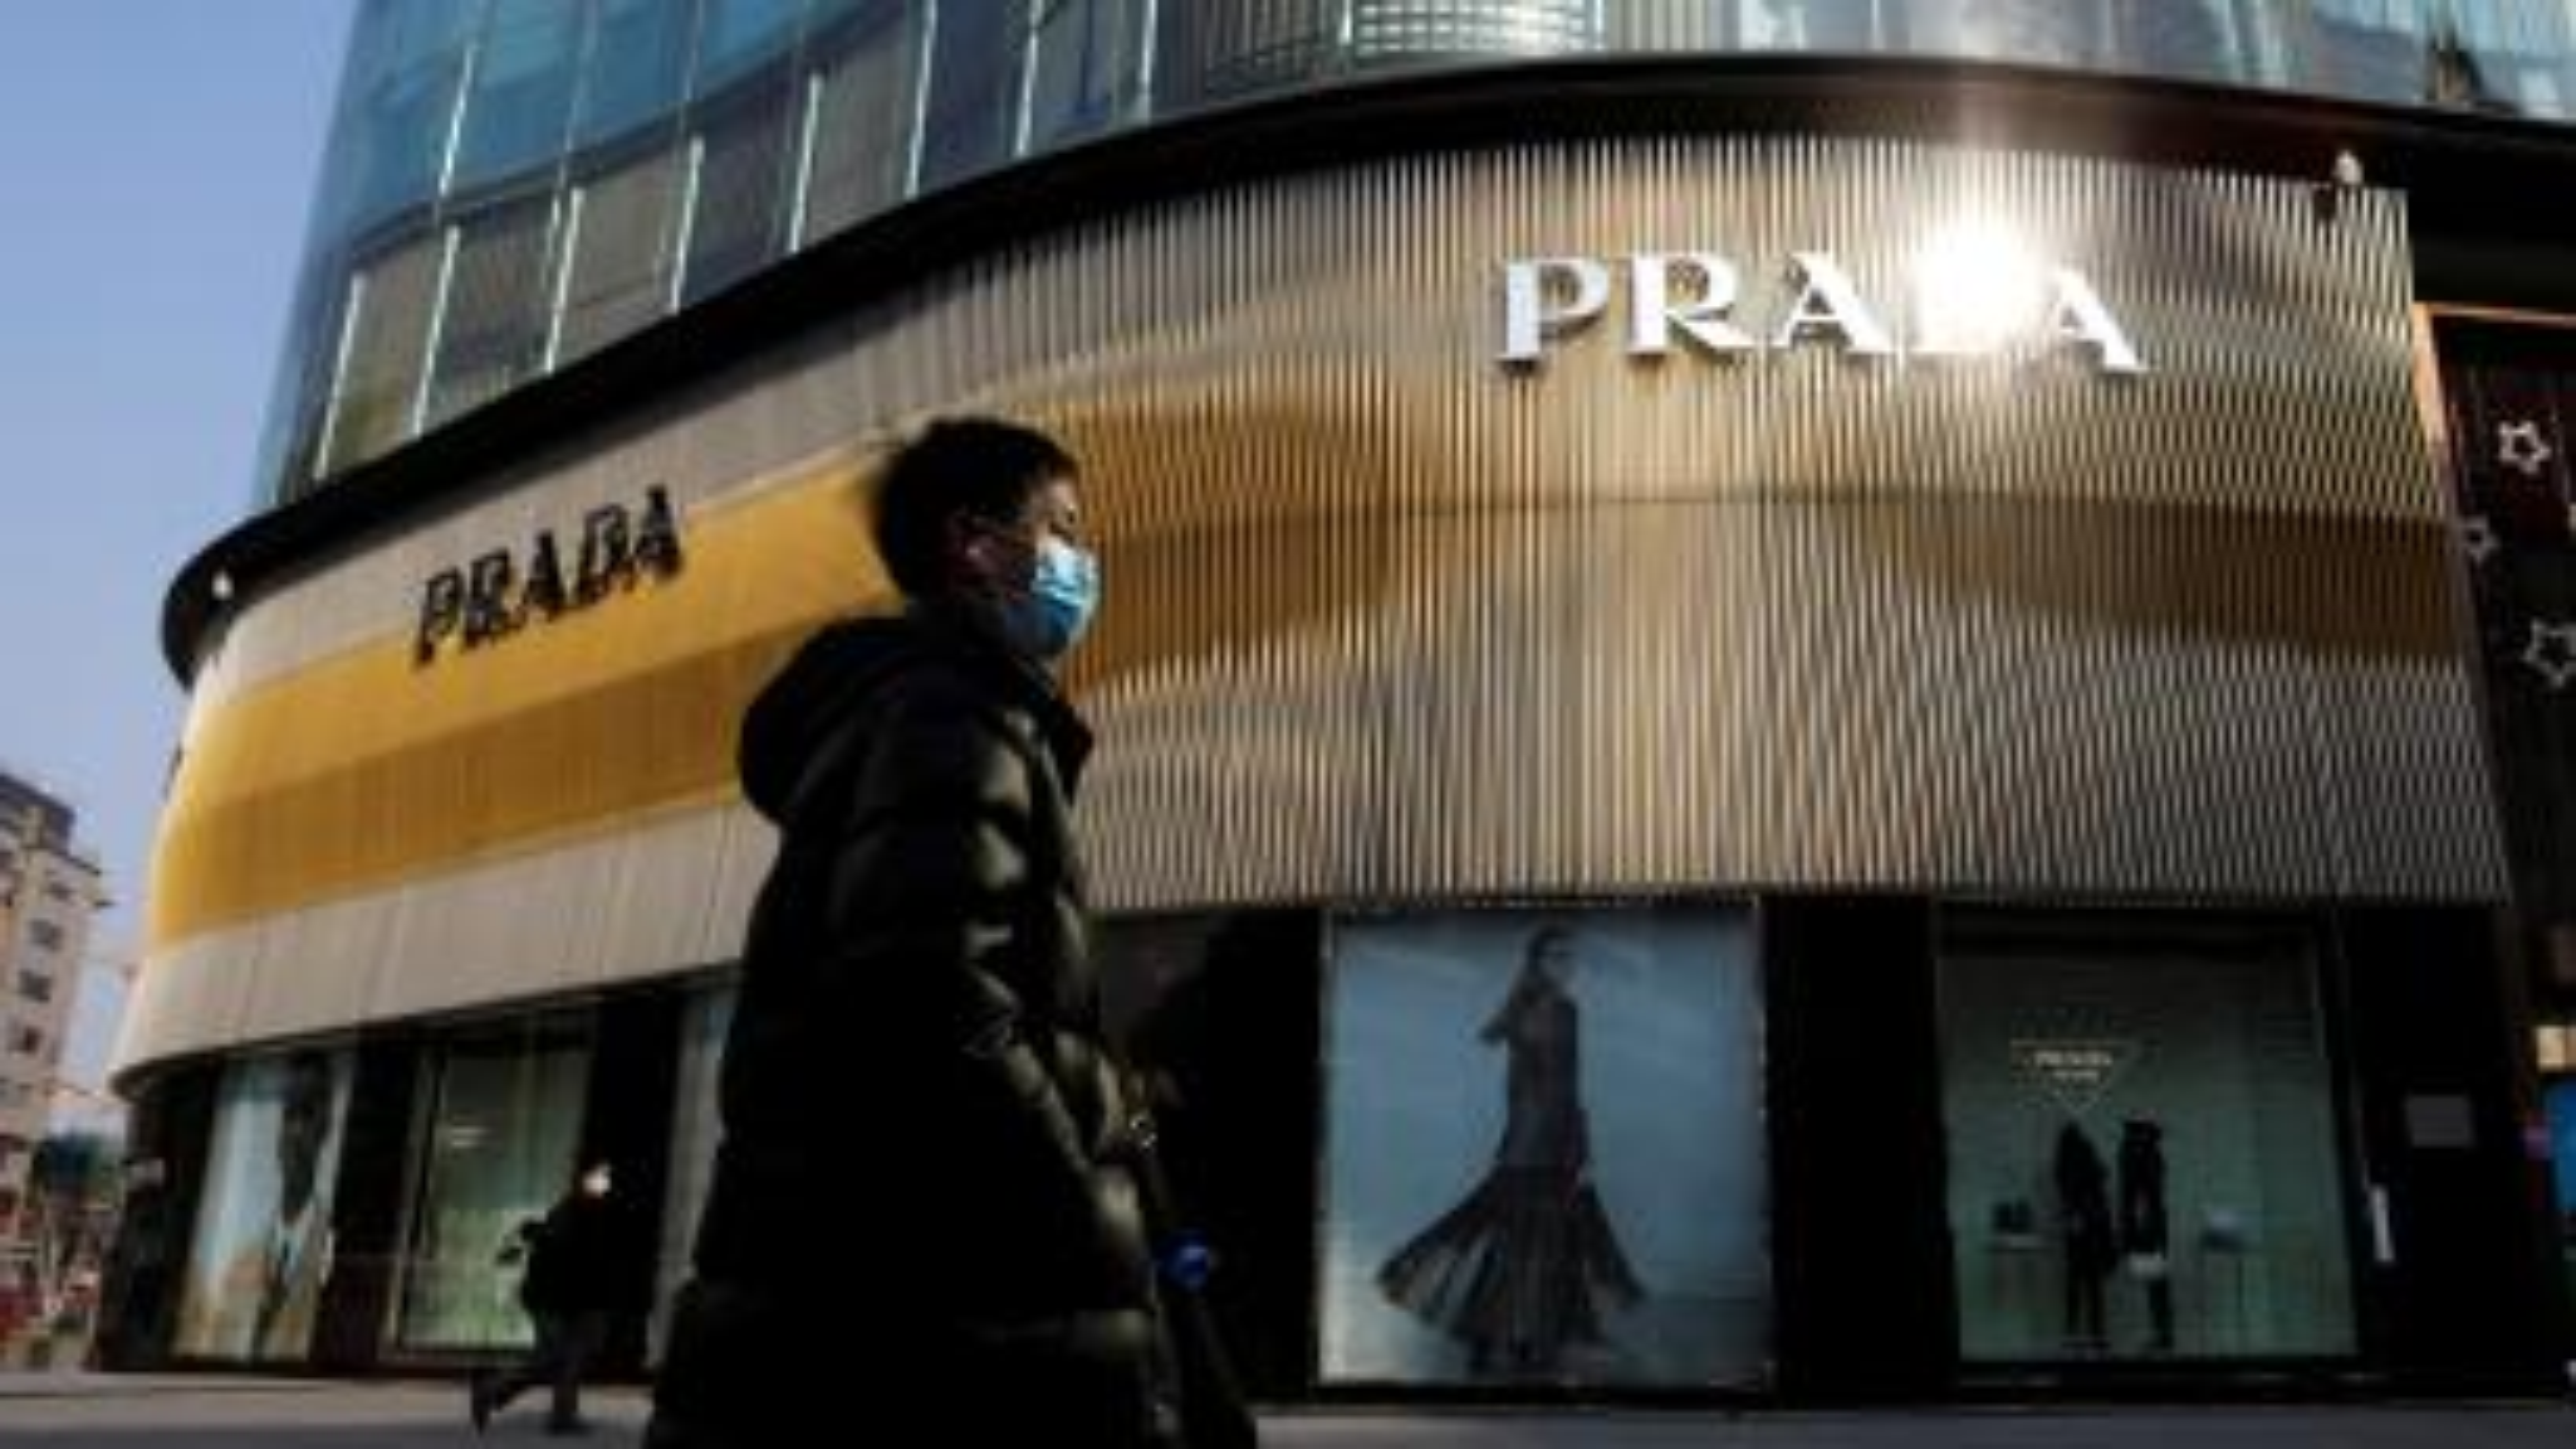 A man walks past a Prada store in Beijing